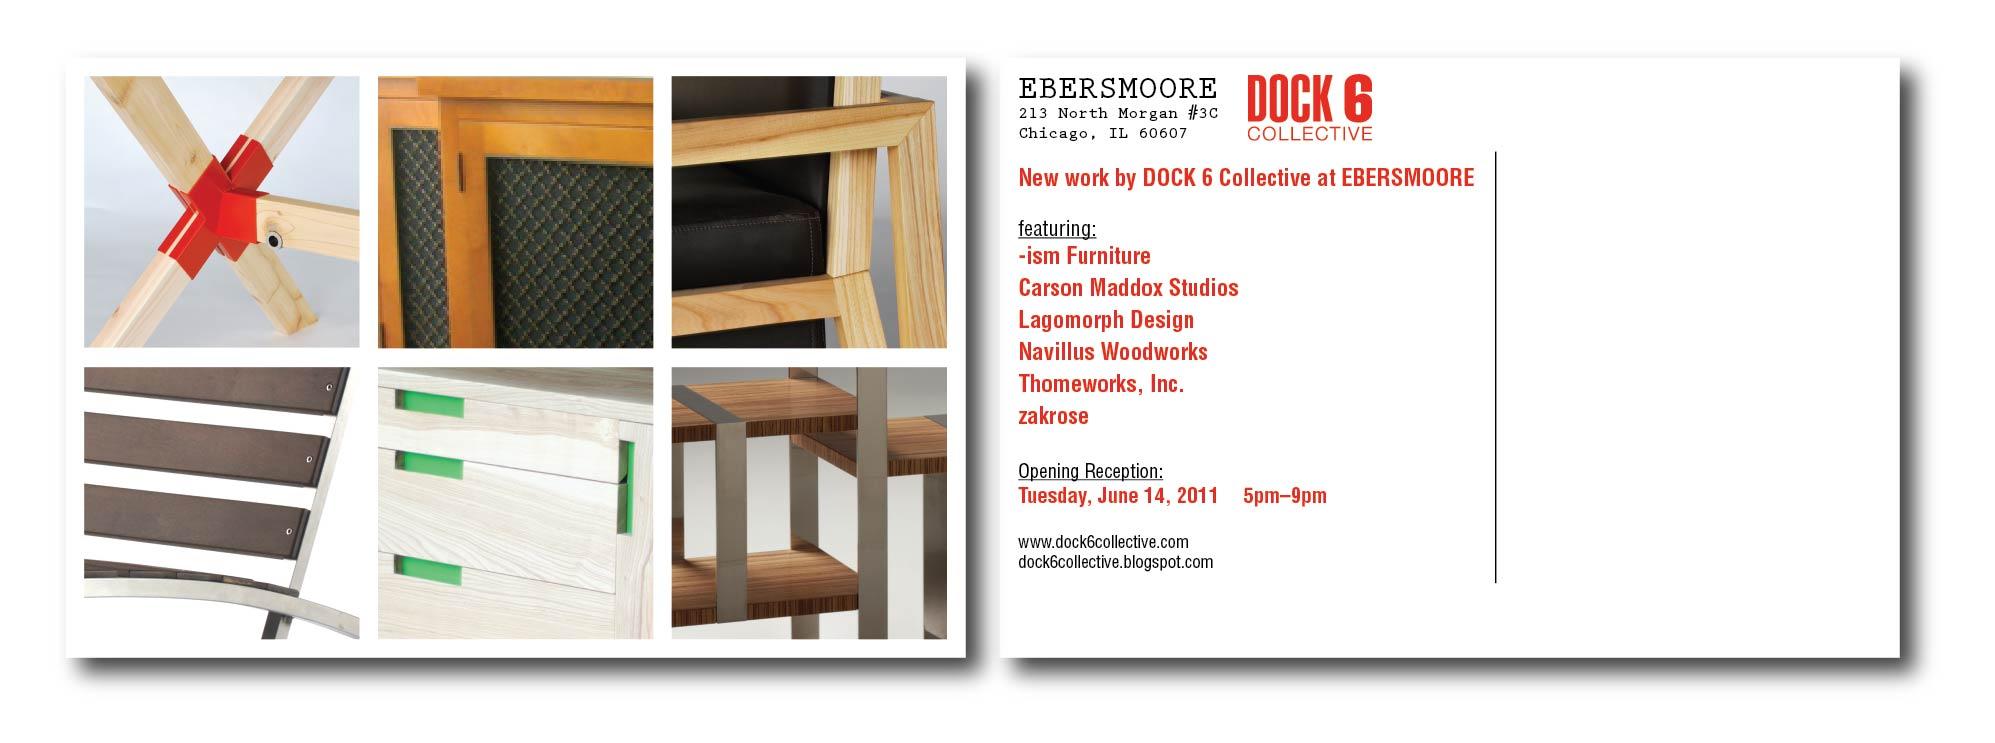 Dock 6 invitation